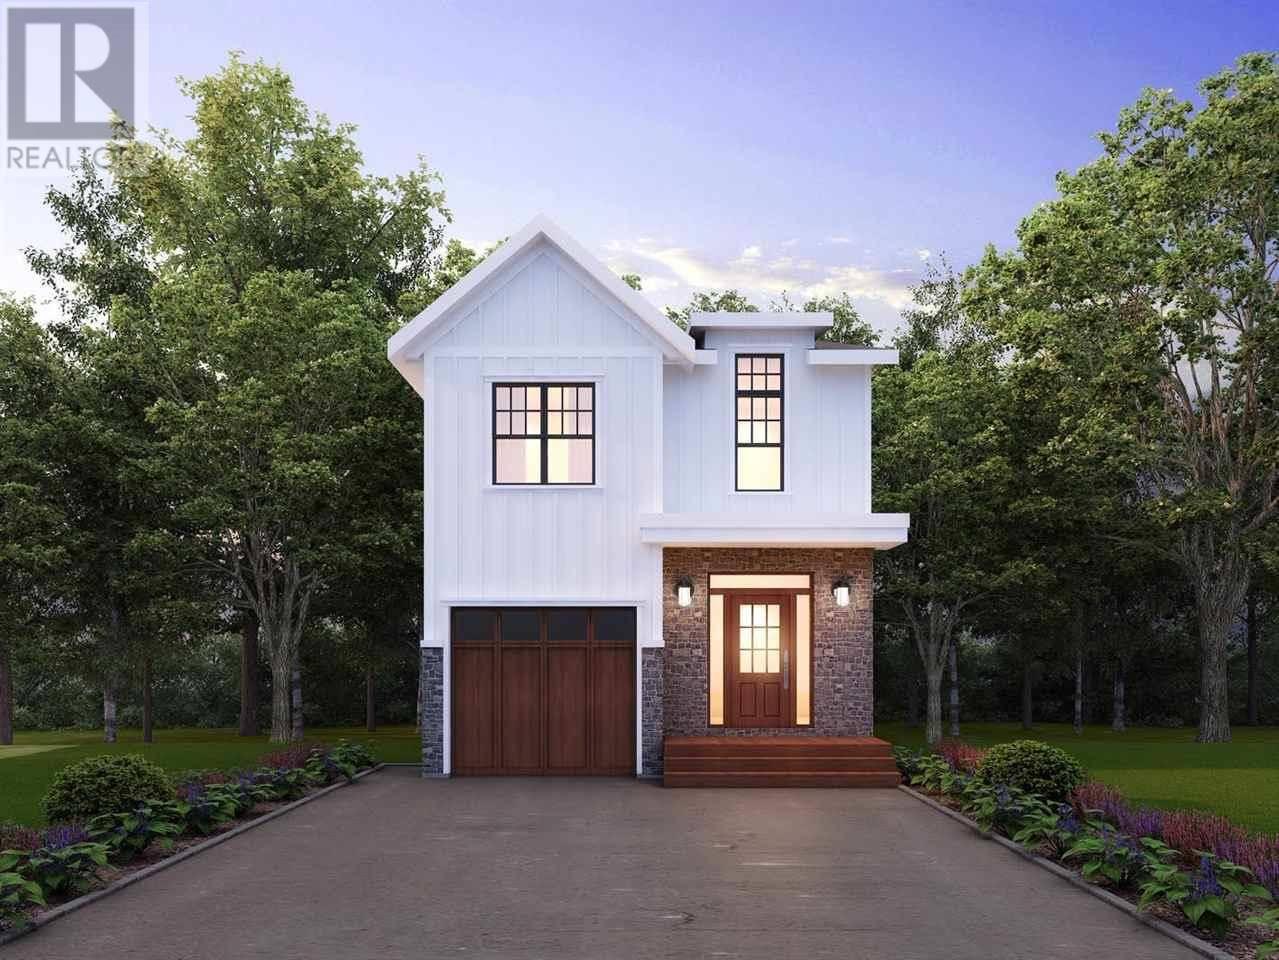 House for sale at 72 Elizabeth Doane Dr Unit Lot Ed37 Bedford Nova Scotia - MLS: 202001214